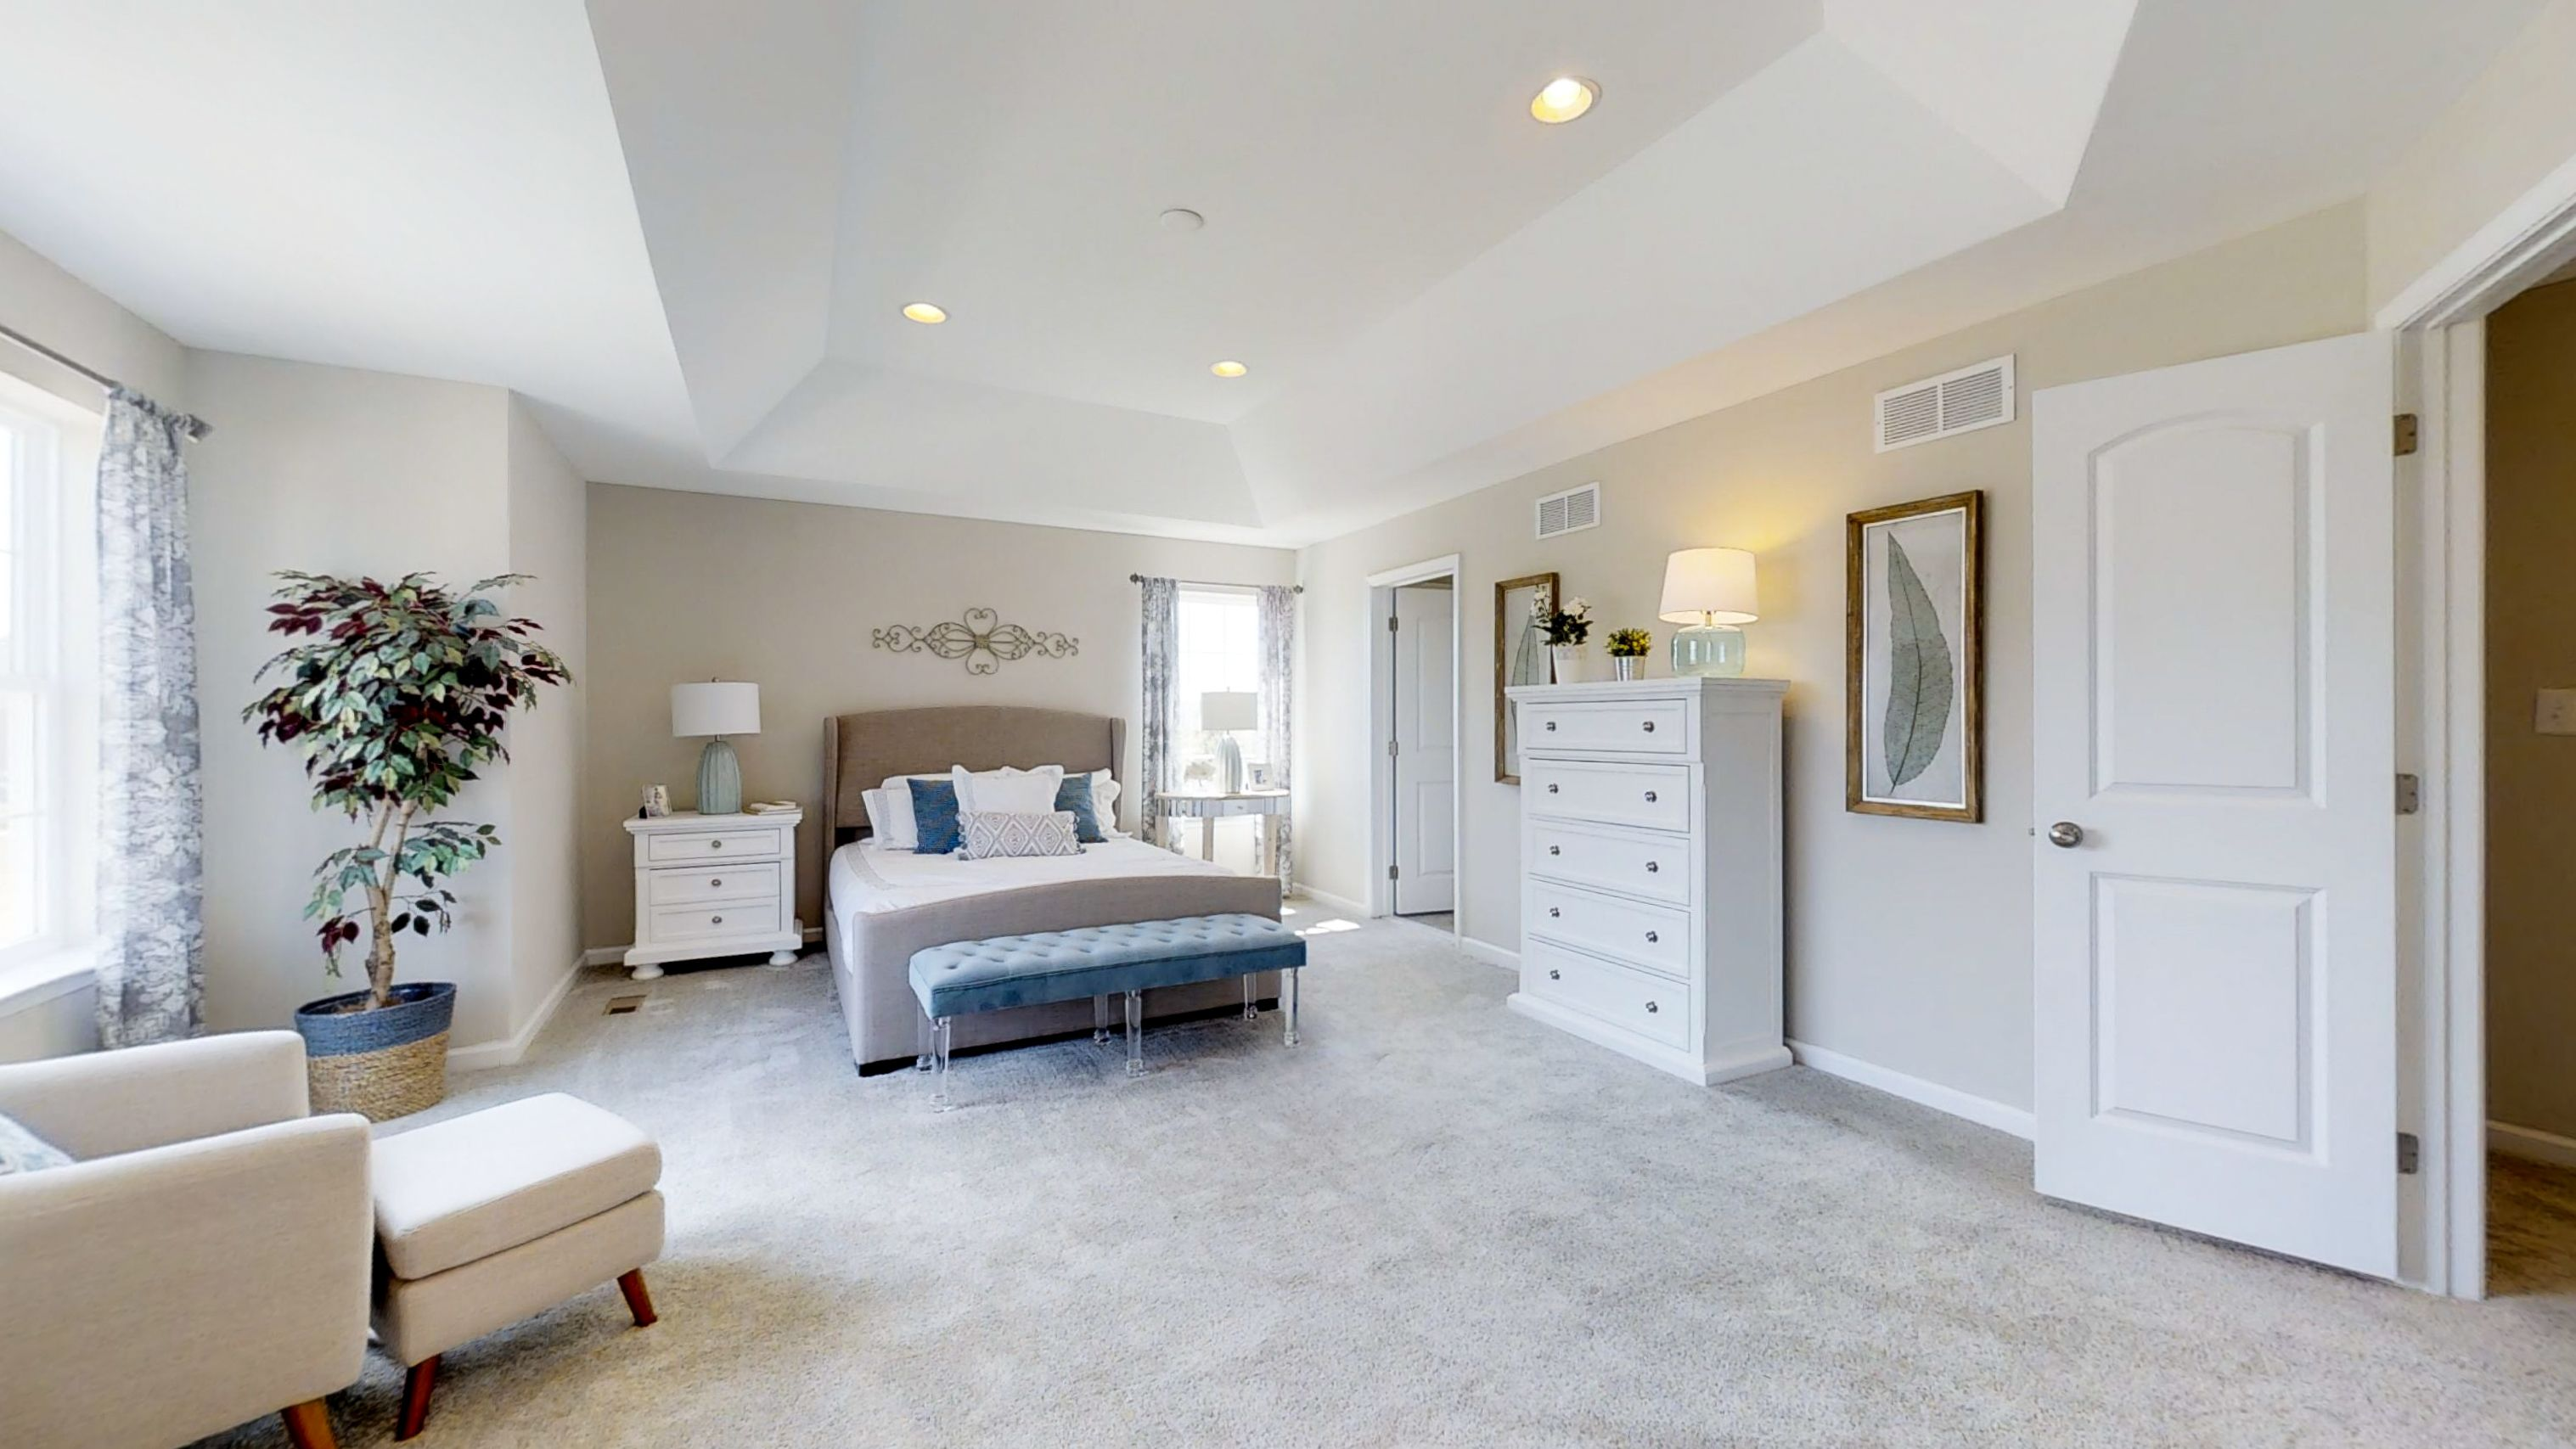 Bedroom featured in The Hancock By JS Homes in Dover, DE